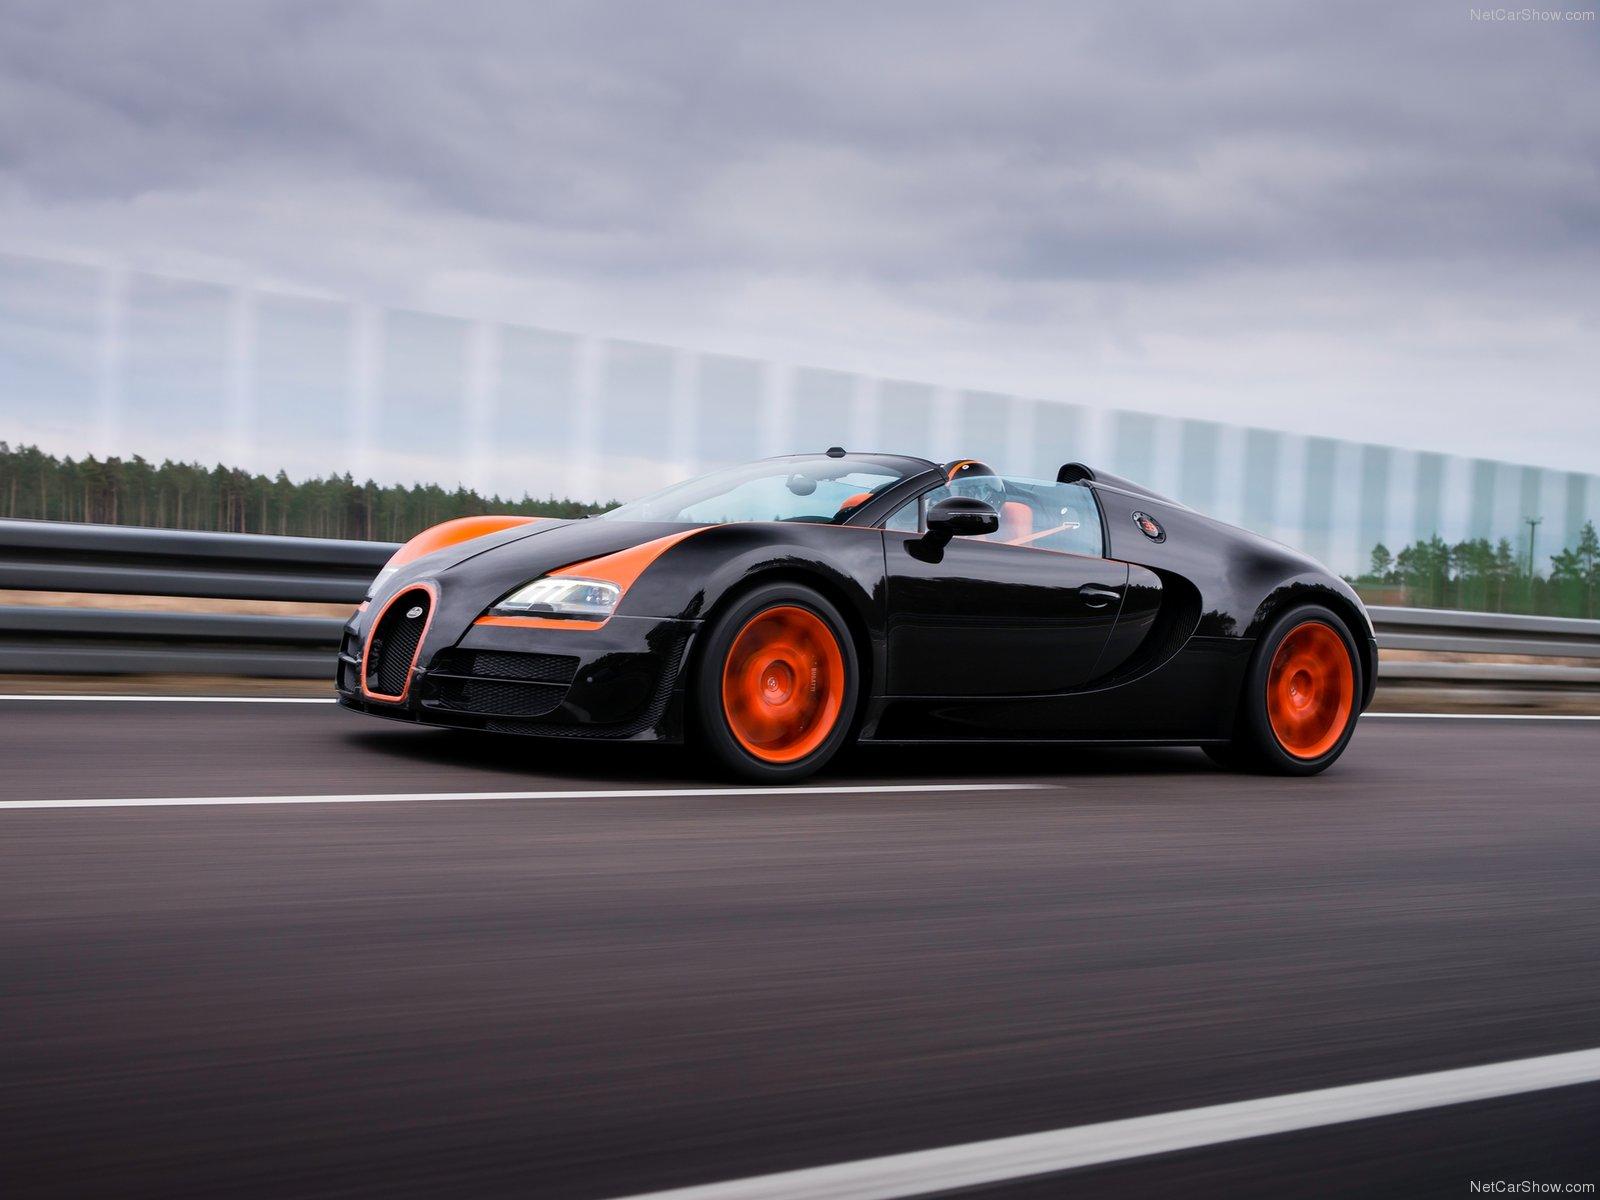 2013%2BBugatti%2BVeyron%2BGrand%2BSport%2BVitesse%2BWRC%2B%25282%2529 Astounding Xe Bugatti Veyron Grand Sport Vitesse Cars Trend